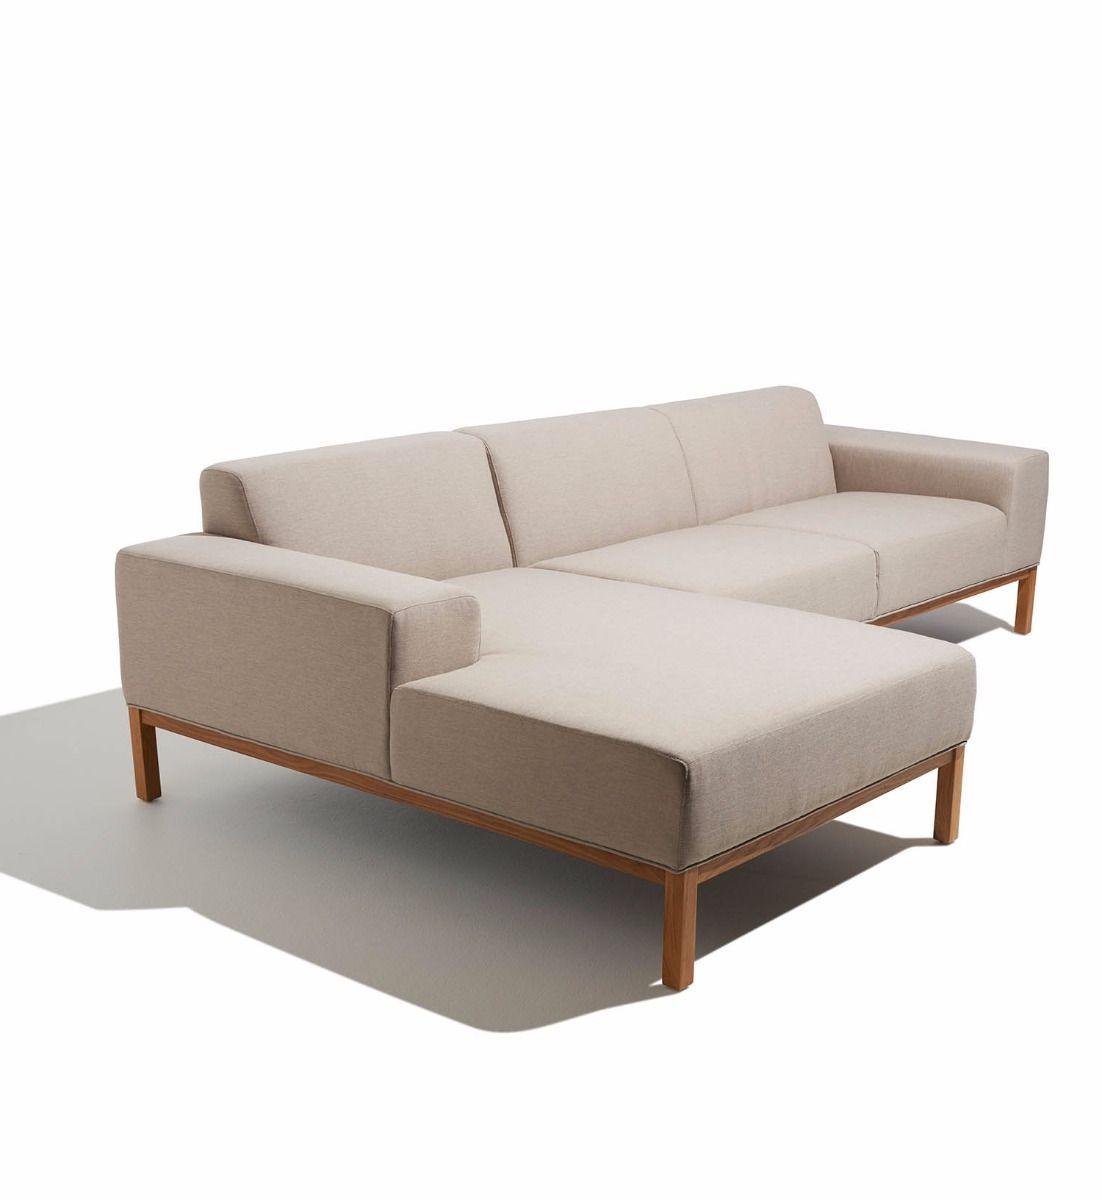 Fine Stratos Sofa Left Chaise Furniture In 2019 Sofa Sofa Ibusinesslaw Wood Chair Design Ideas Ibusinesslaworg